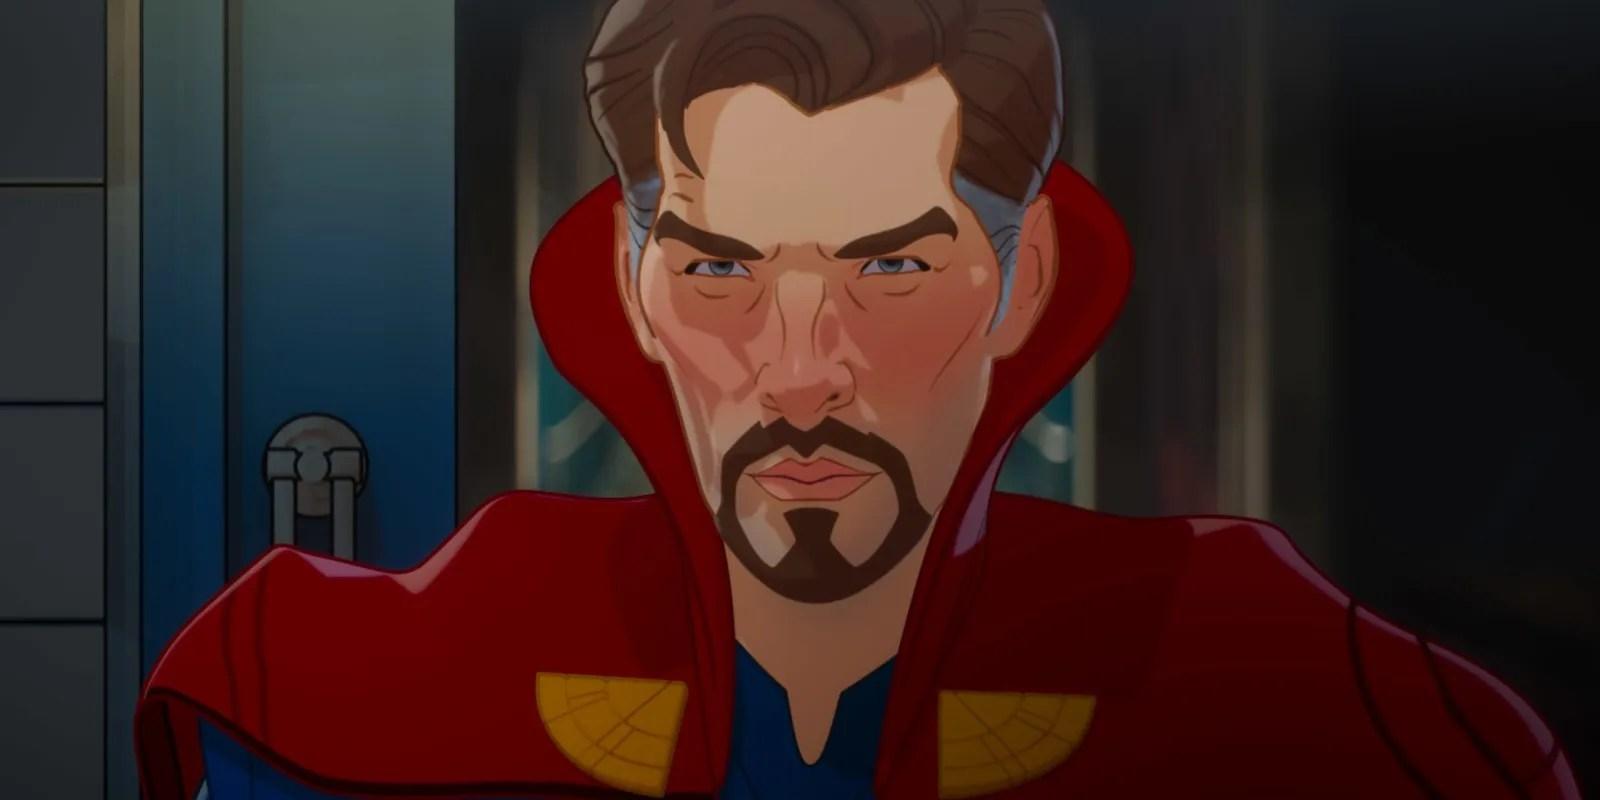 Marvel's What If Episode 4 Images Tease Doctor Strange's Story